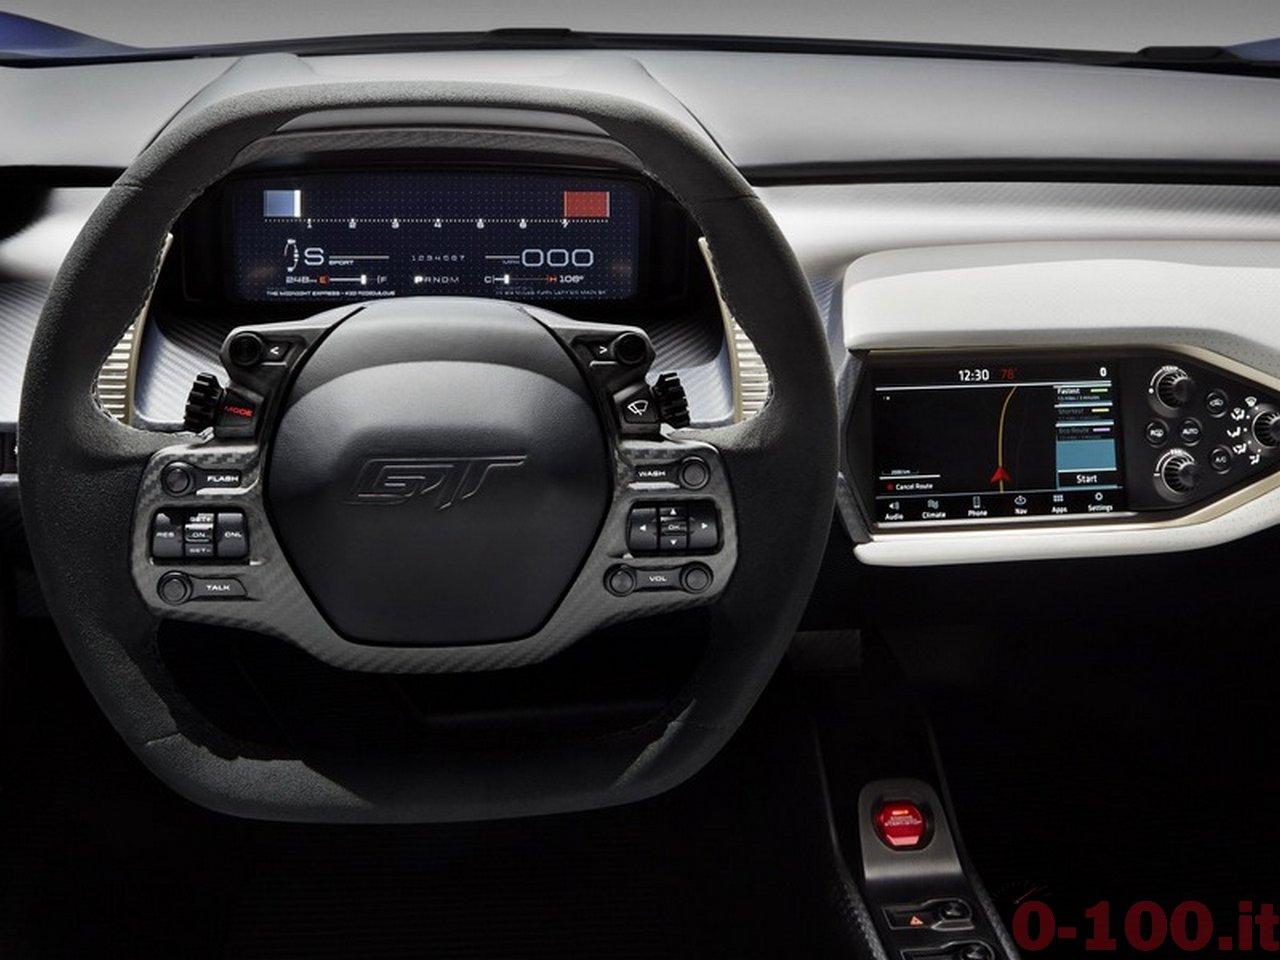 naias-salone-autoshow-detroit-2015-ford-gt-v6-ecoboost-prezzo-Price_0-100_24